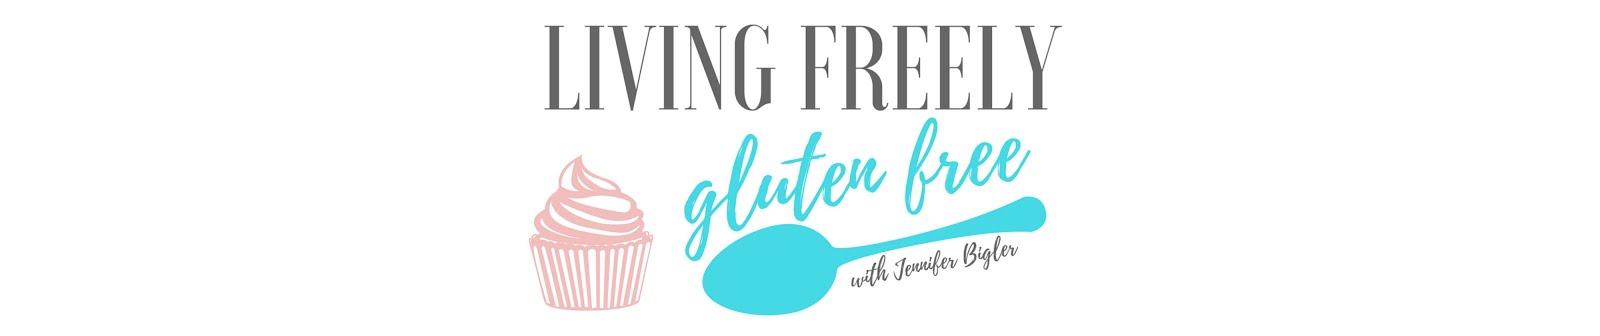 Living freely gluten free